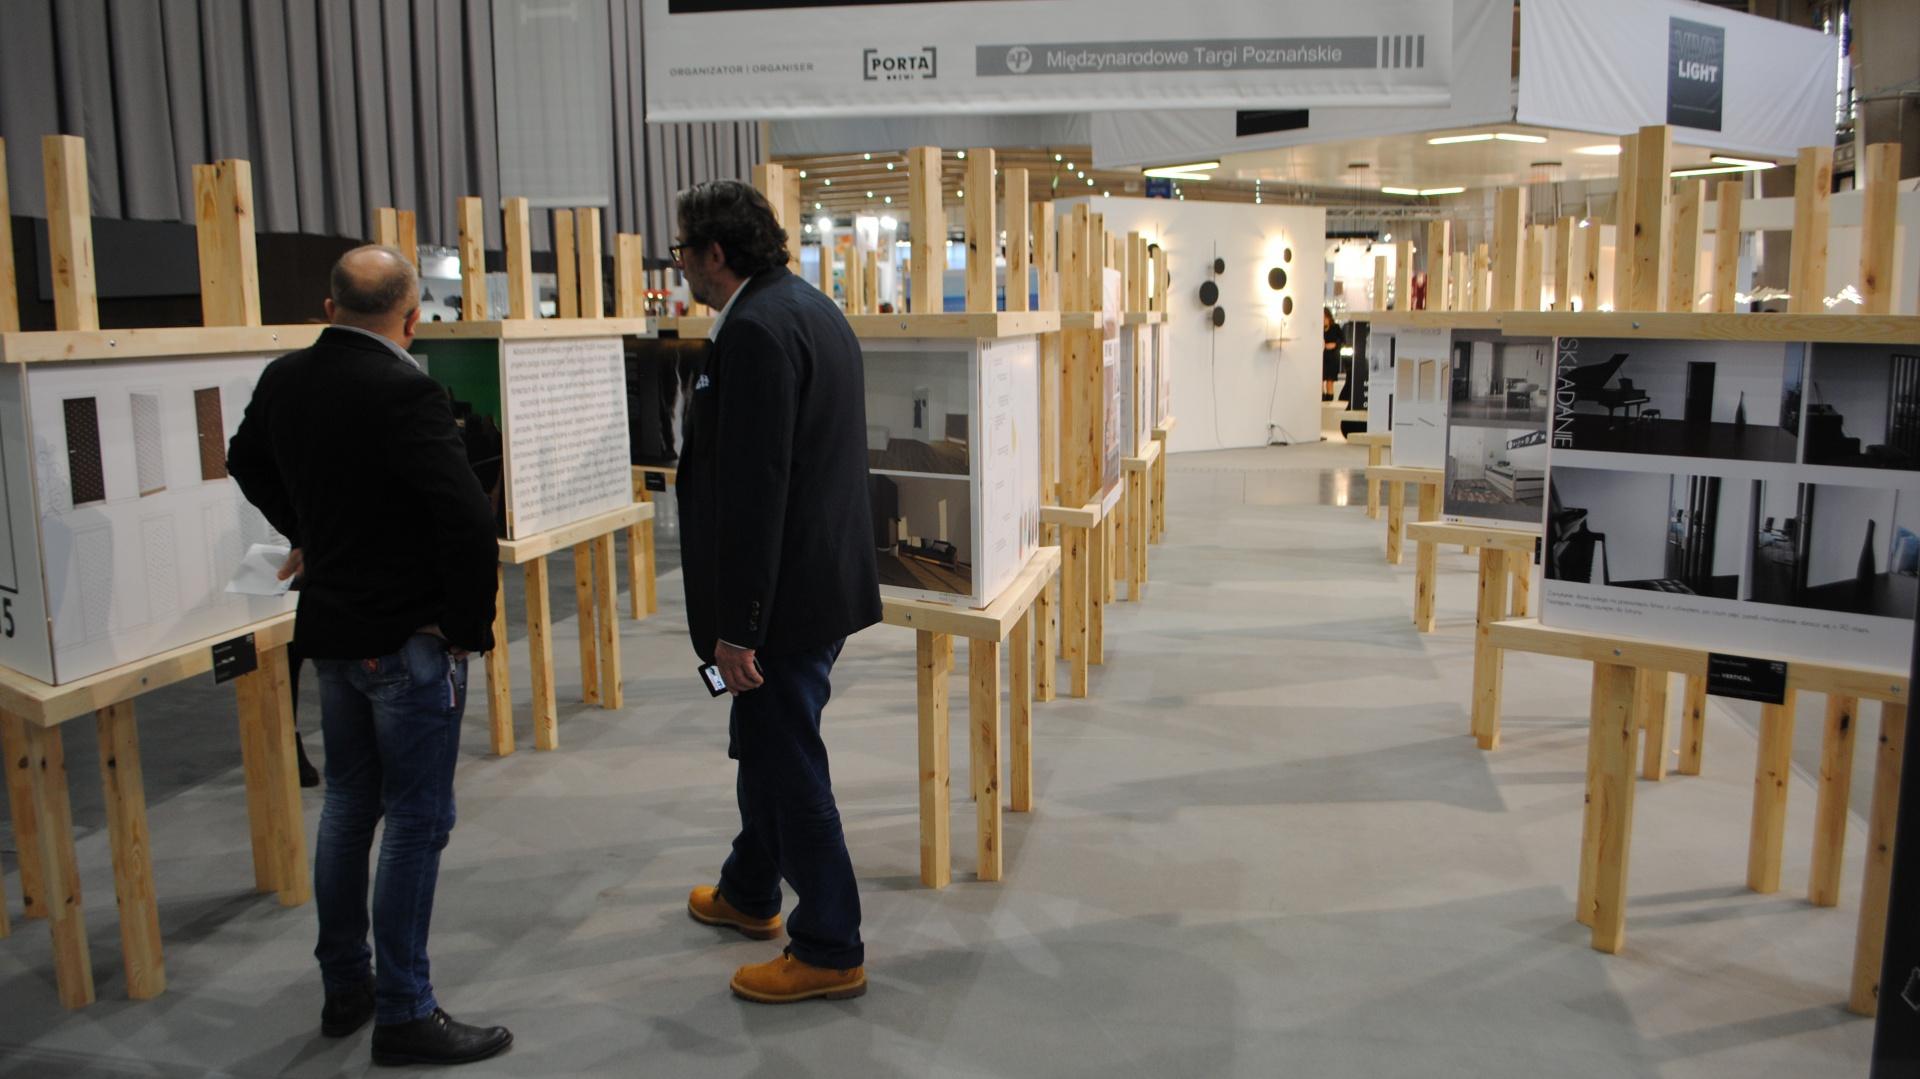 Wystawa konkursu Porta By Me 2015 na MTP. Fot. Piotr Sawczuk